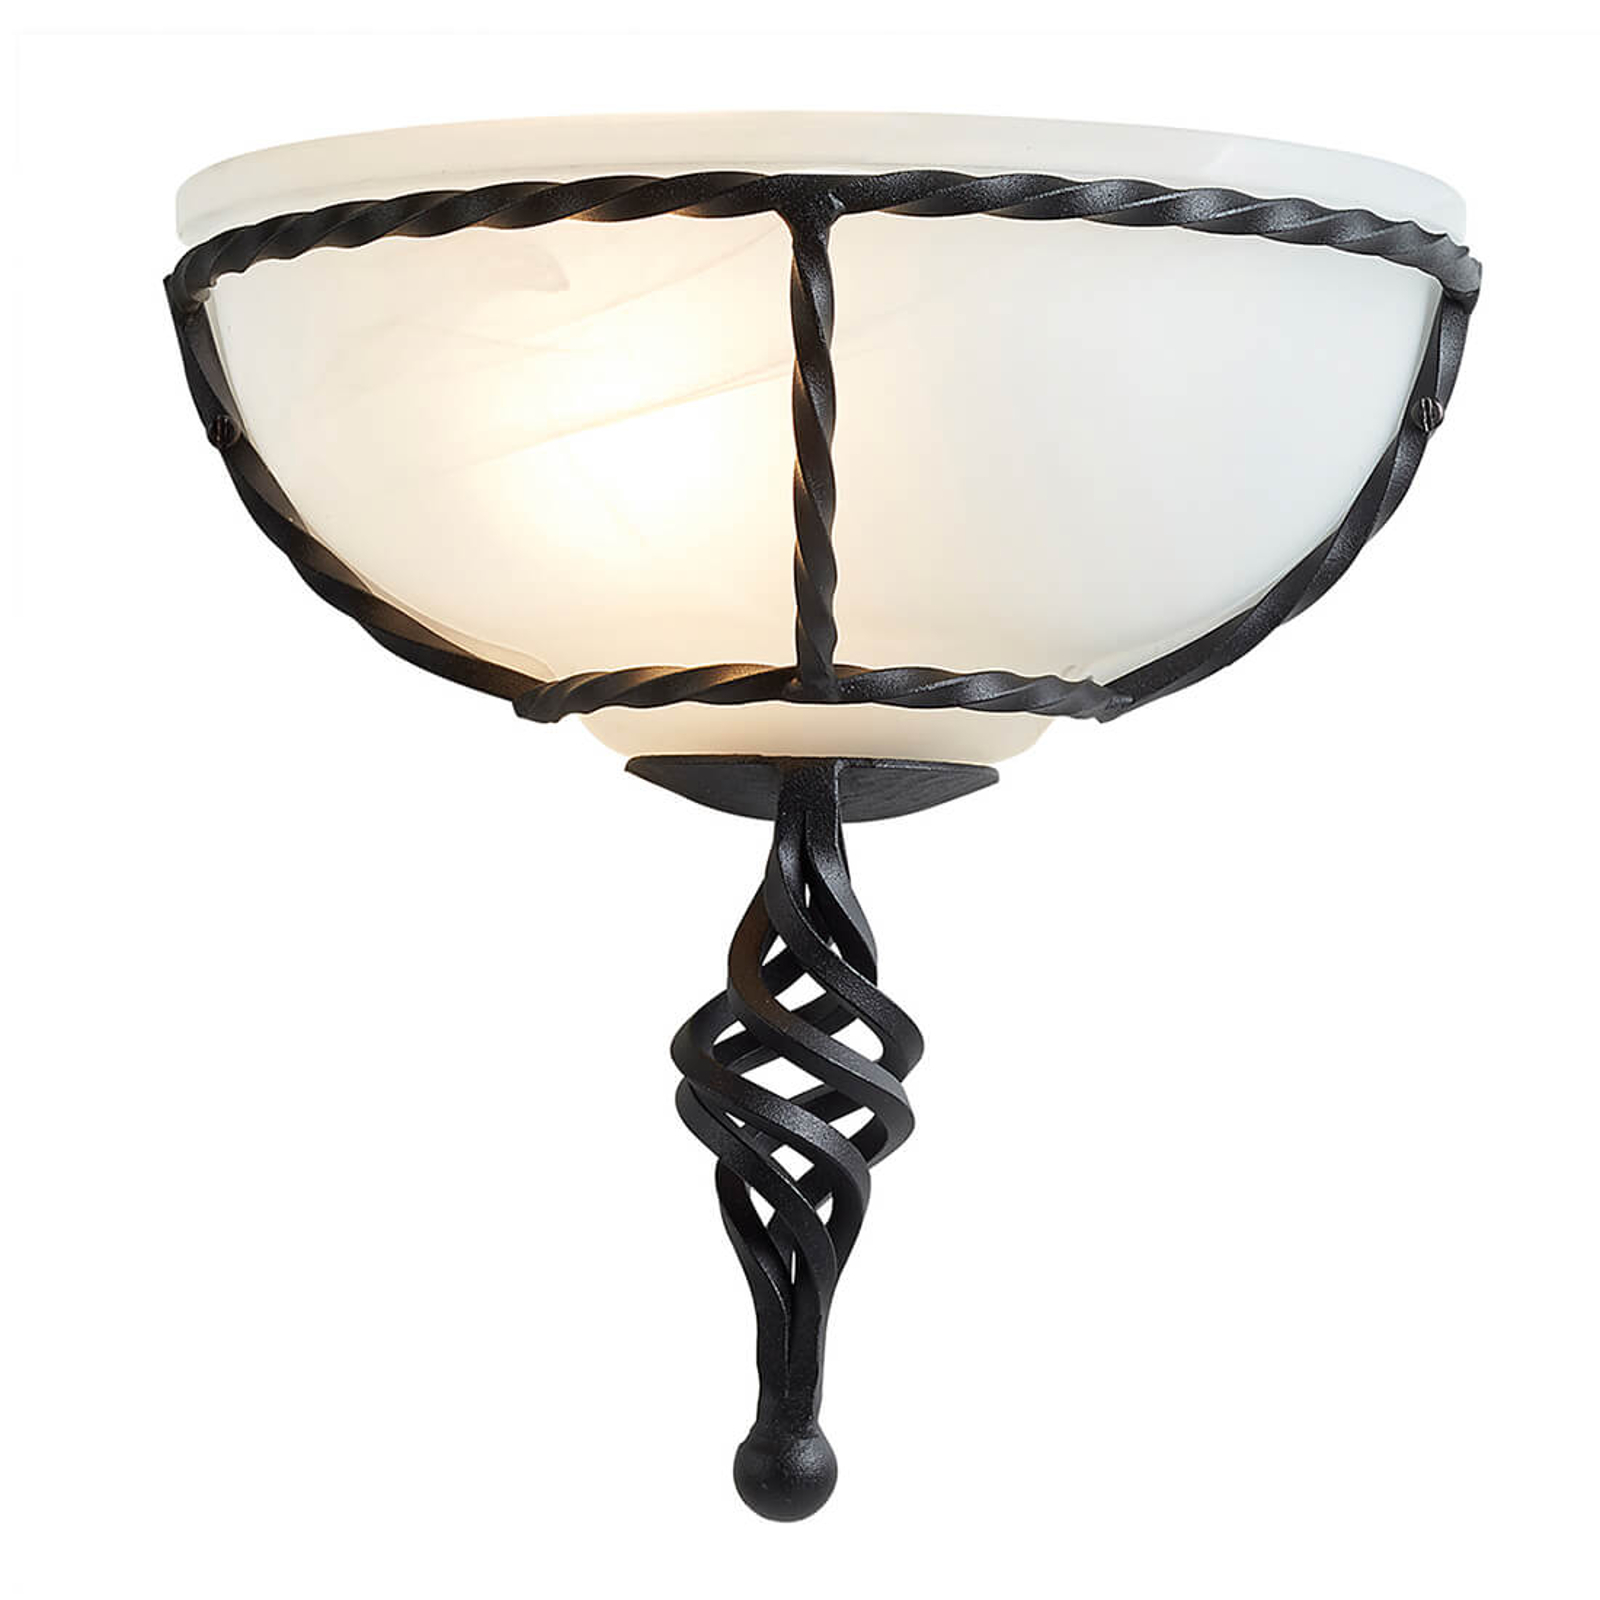 Wandlamp Pembroke, frame zwart